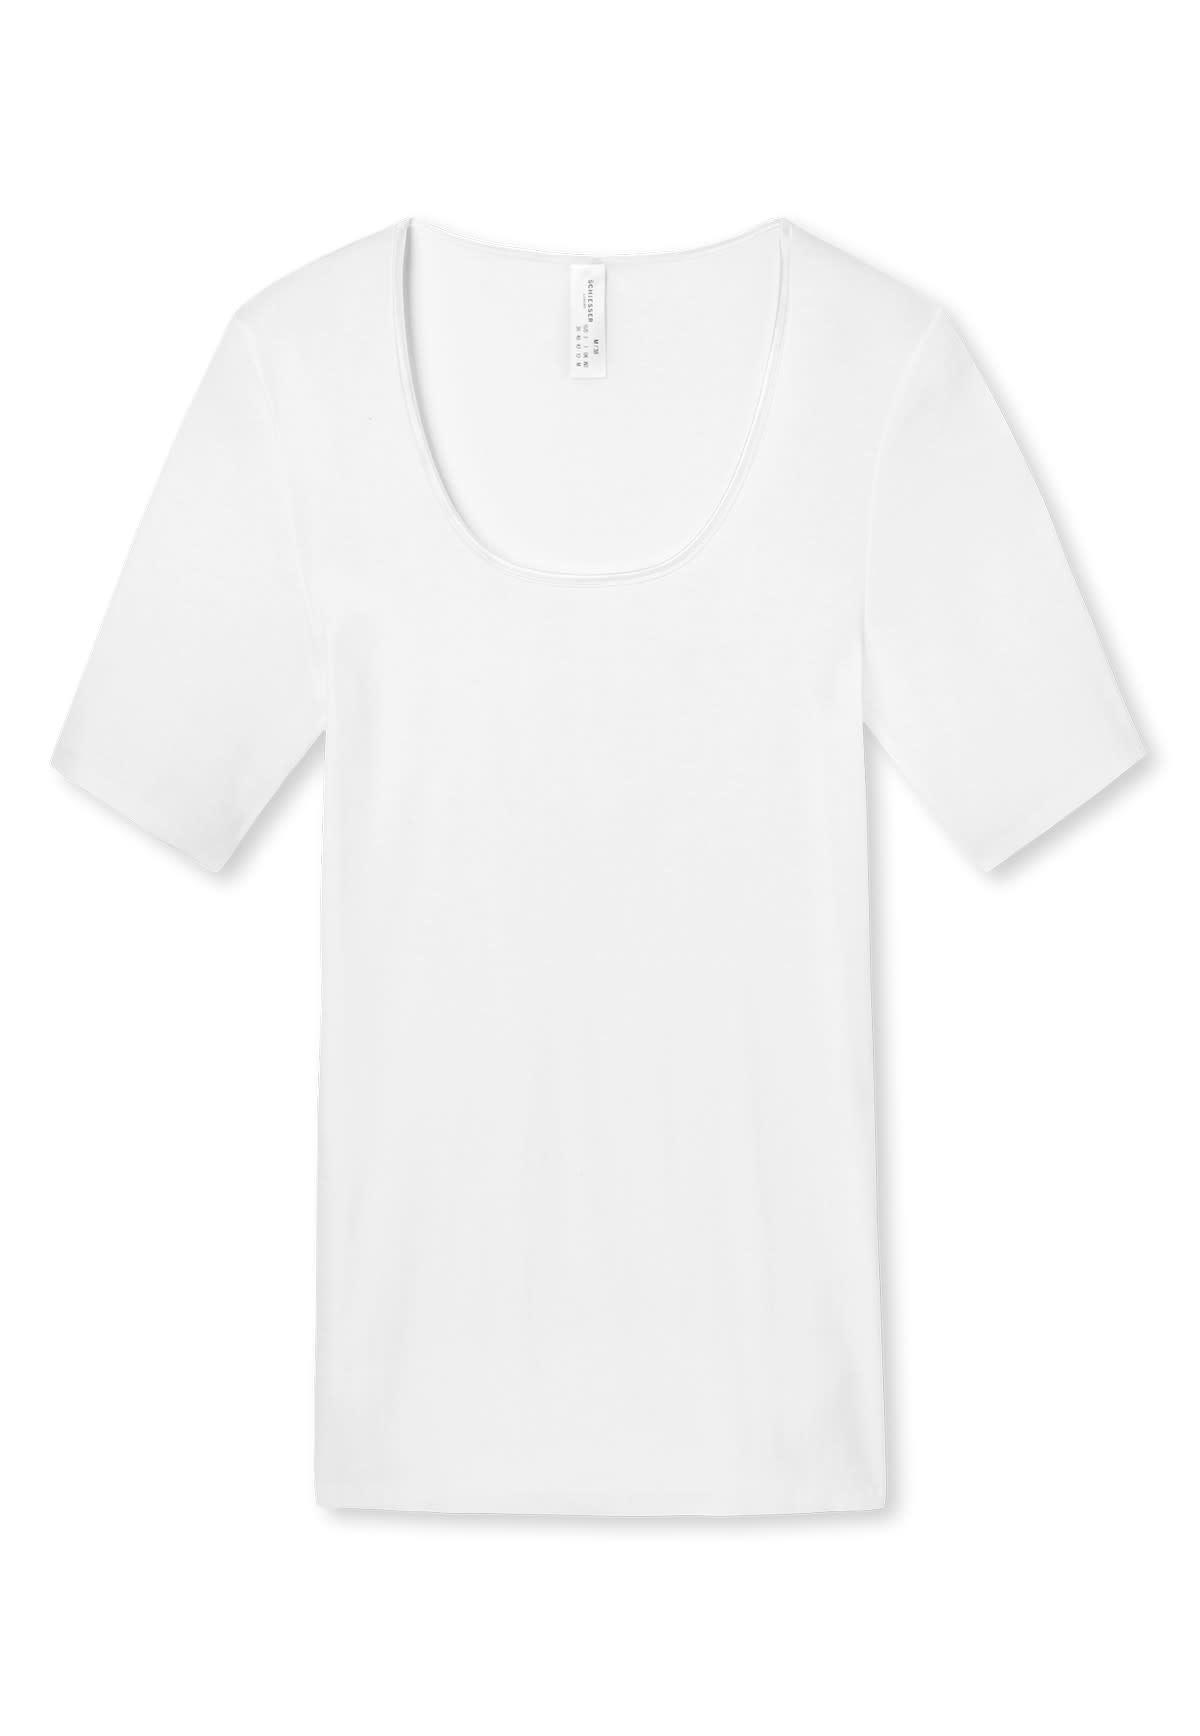 T-shirt Luxury 200764 - wit-3